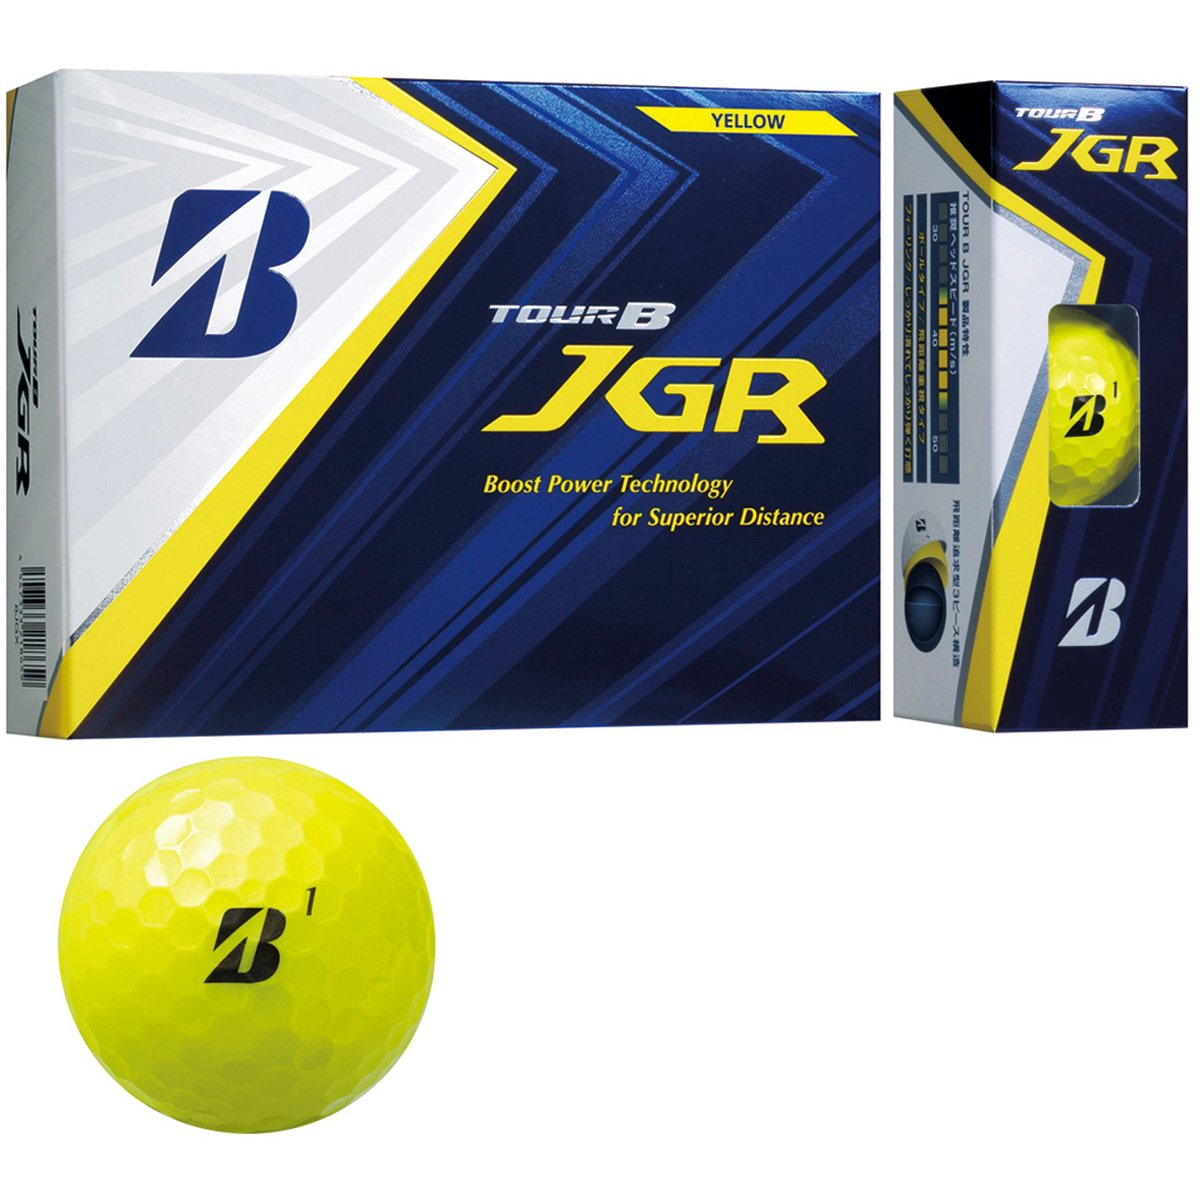 BRIDGESTONE TOUR B JGR YELLOW 8JYX ブリヂストン ツアービー ジェイジーアール イエロー 2ダースパック 24球 ボール ゴルフ 送料無料 平成最後 令和 新生活